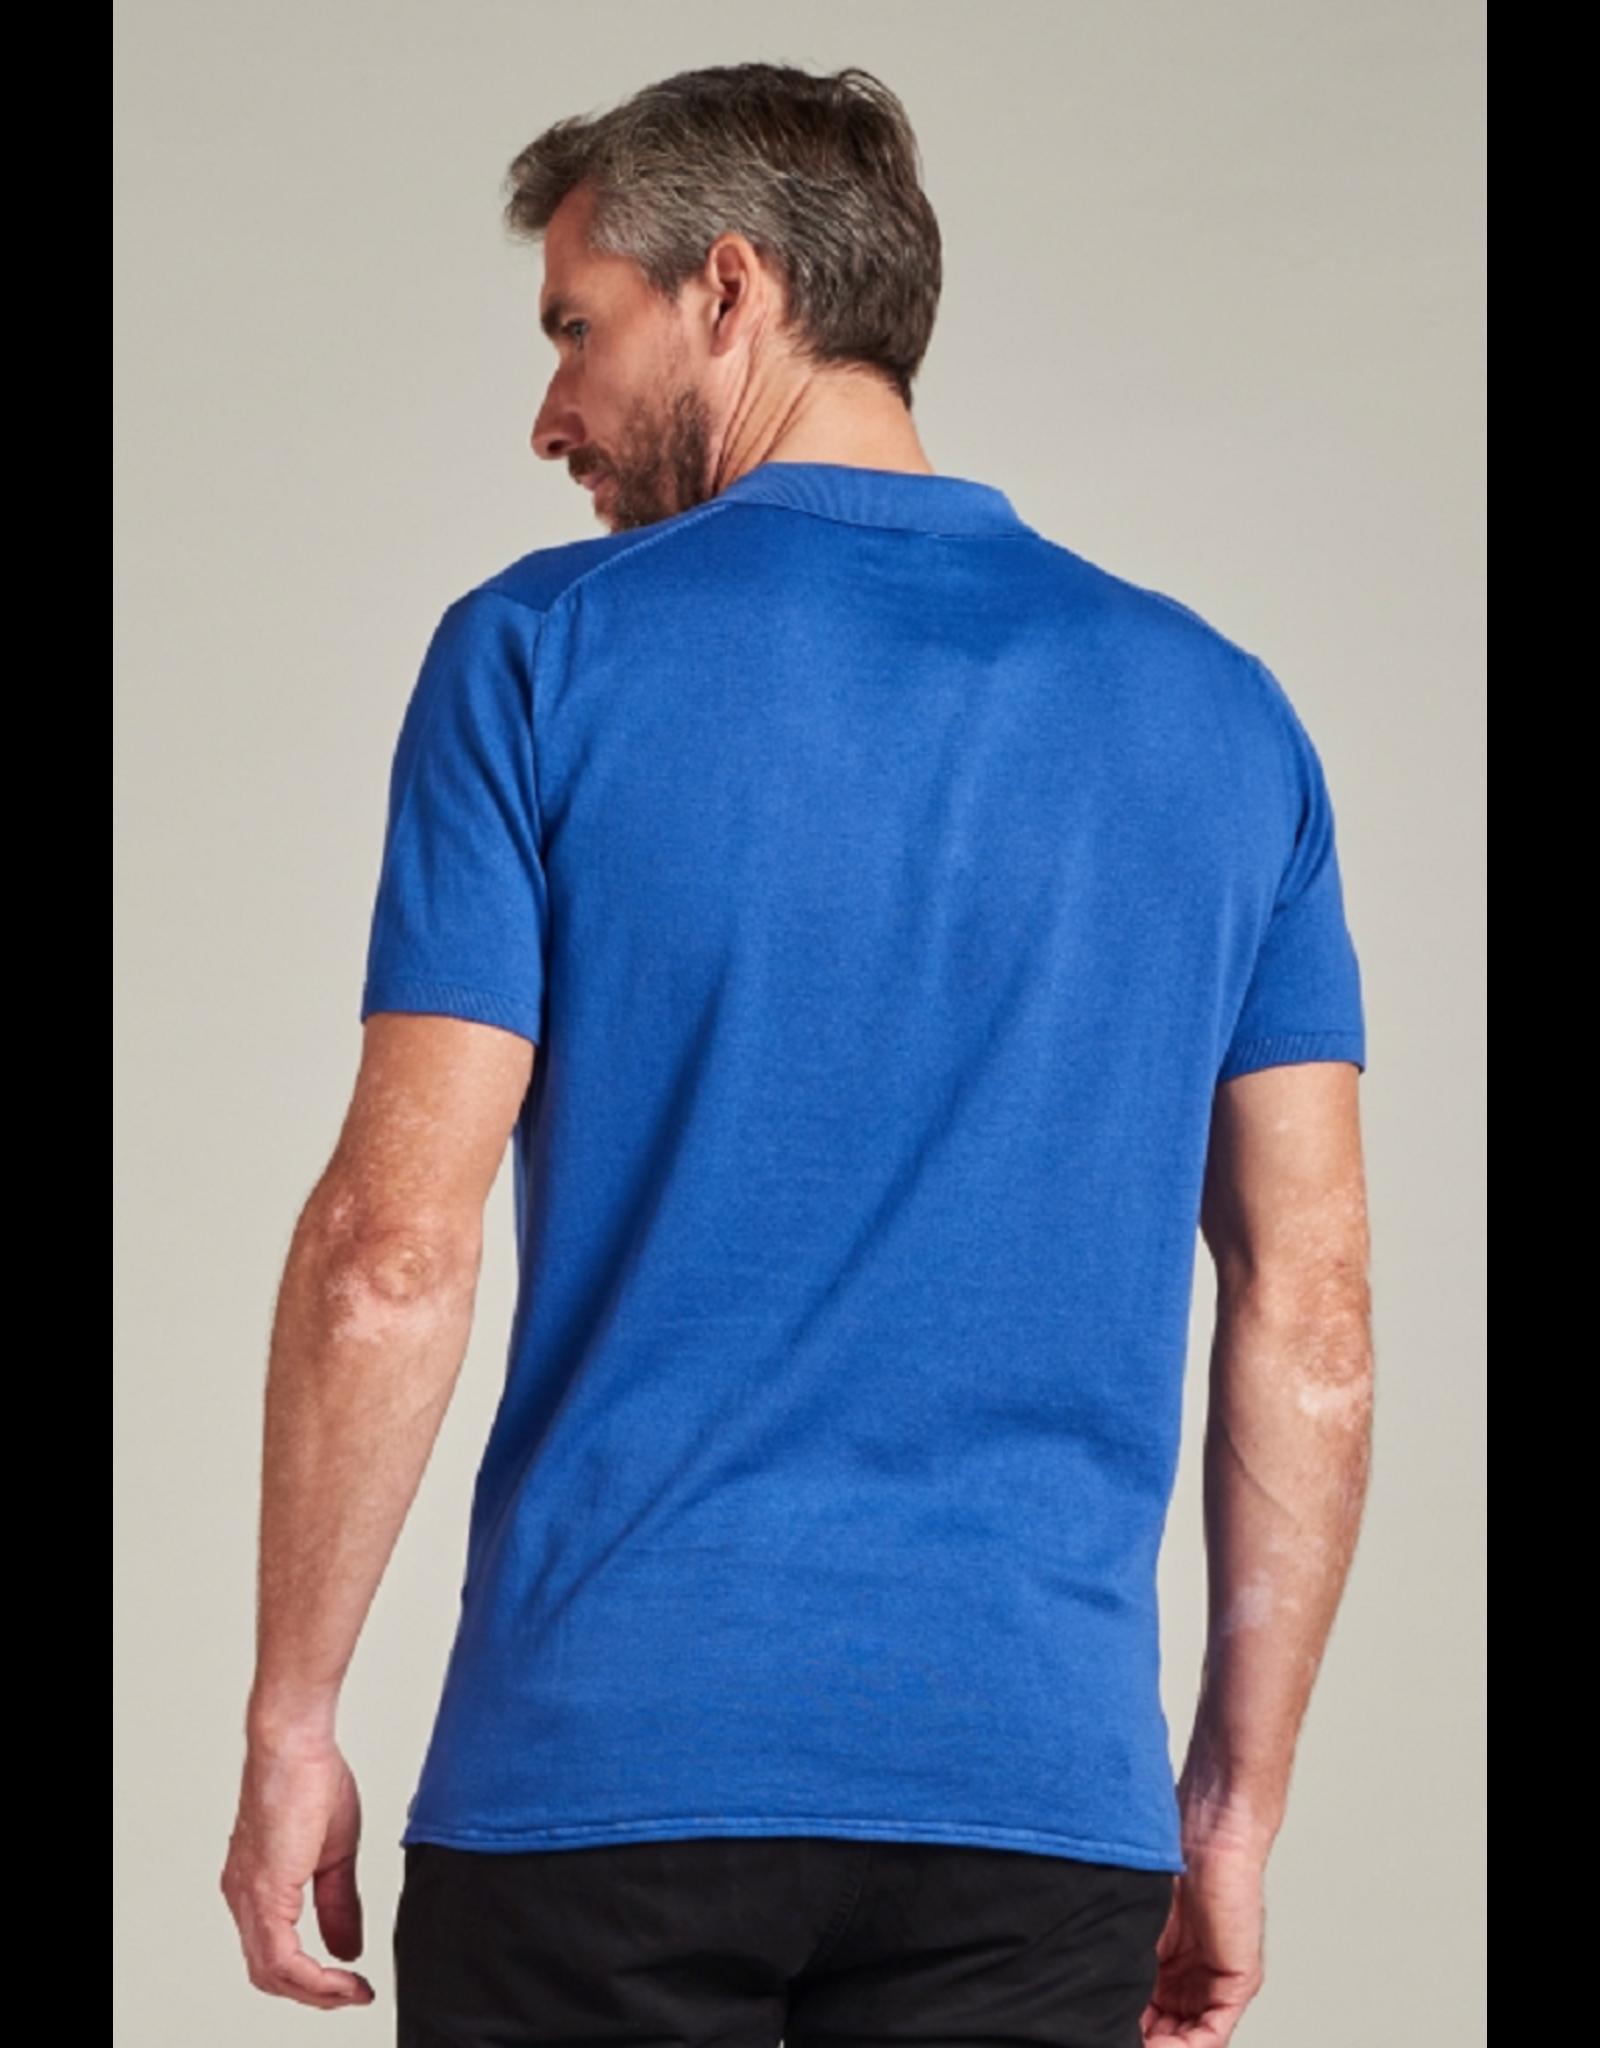 Dstrezed Polo ss Cotton Pigment Knit Kobalt